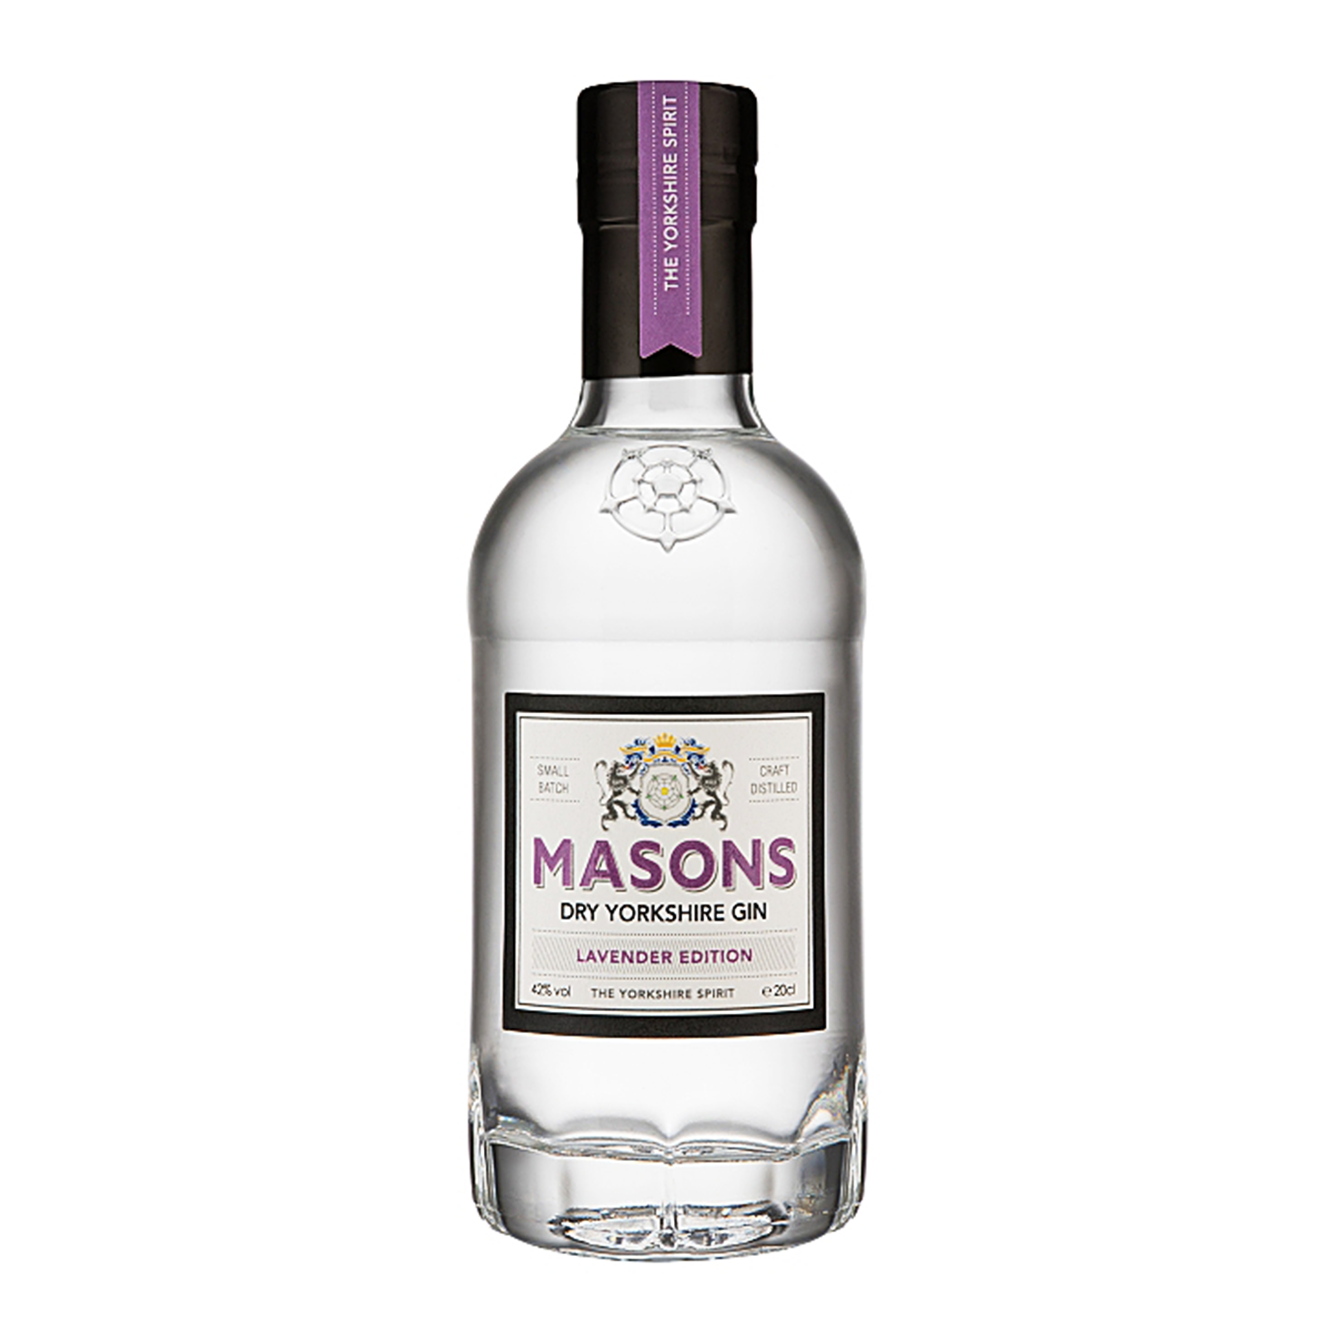 Masons Lavender Edition Gin 200ml